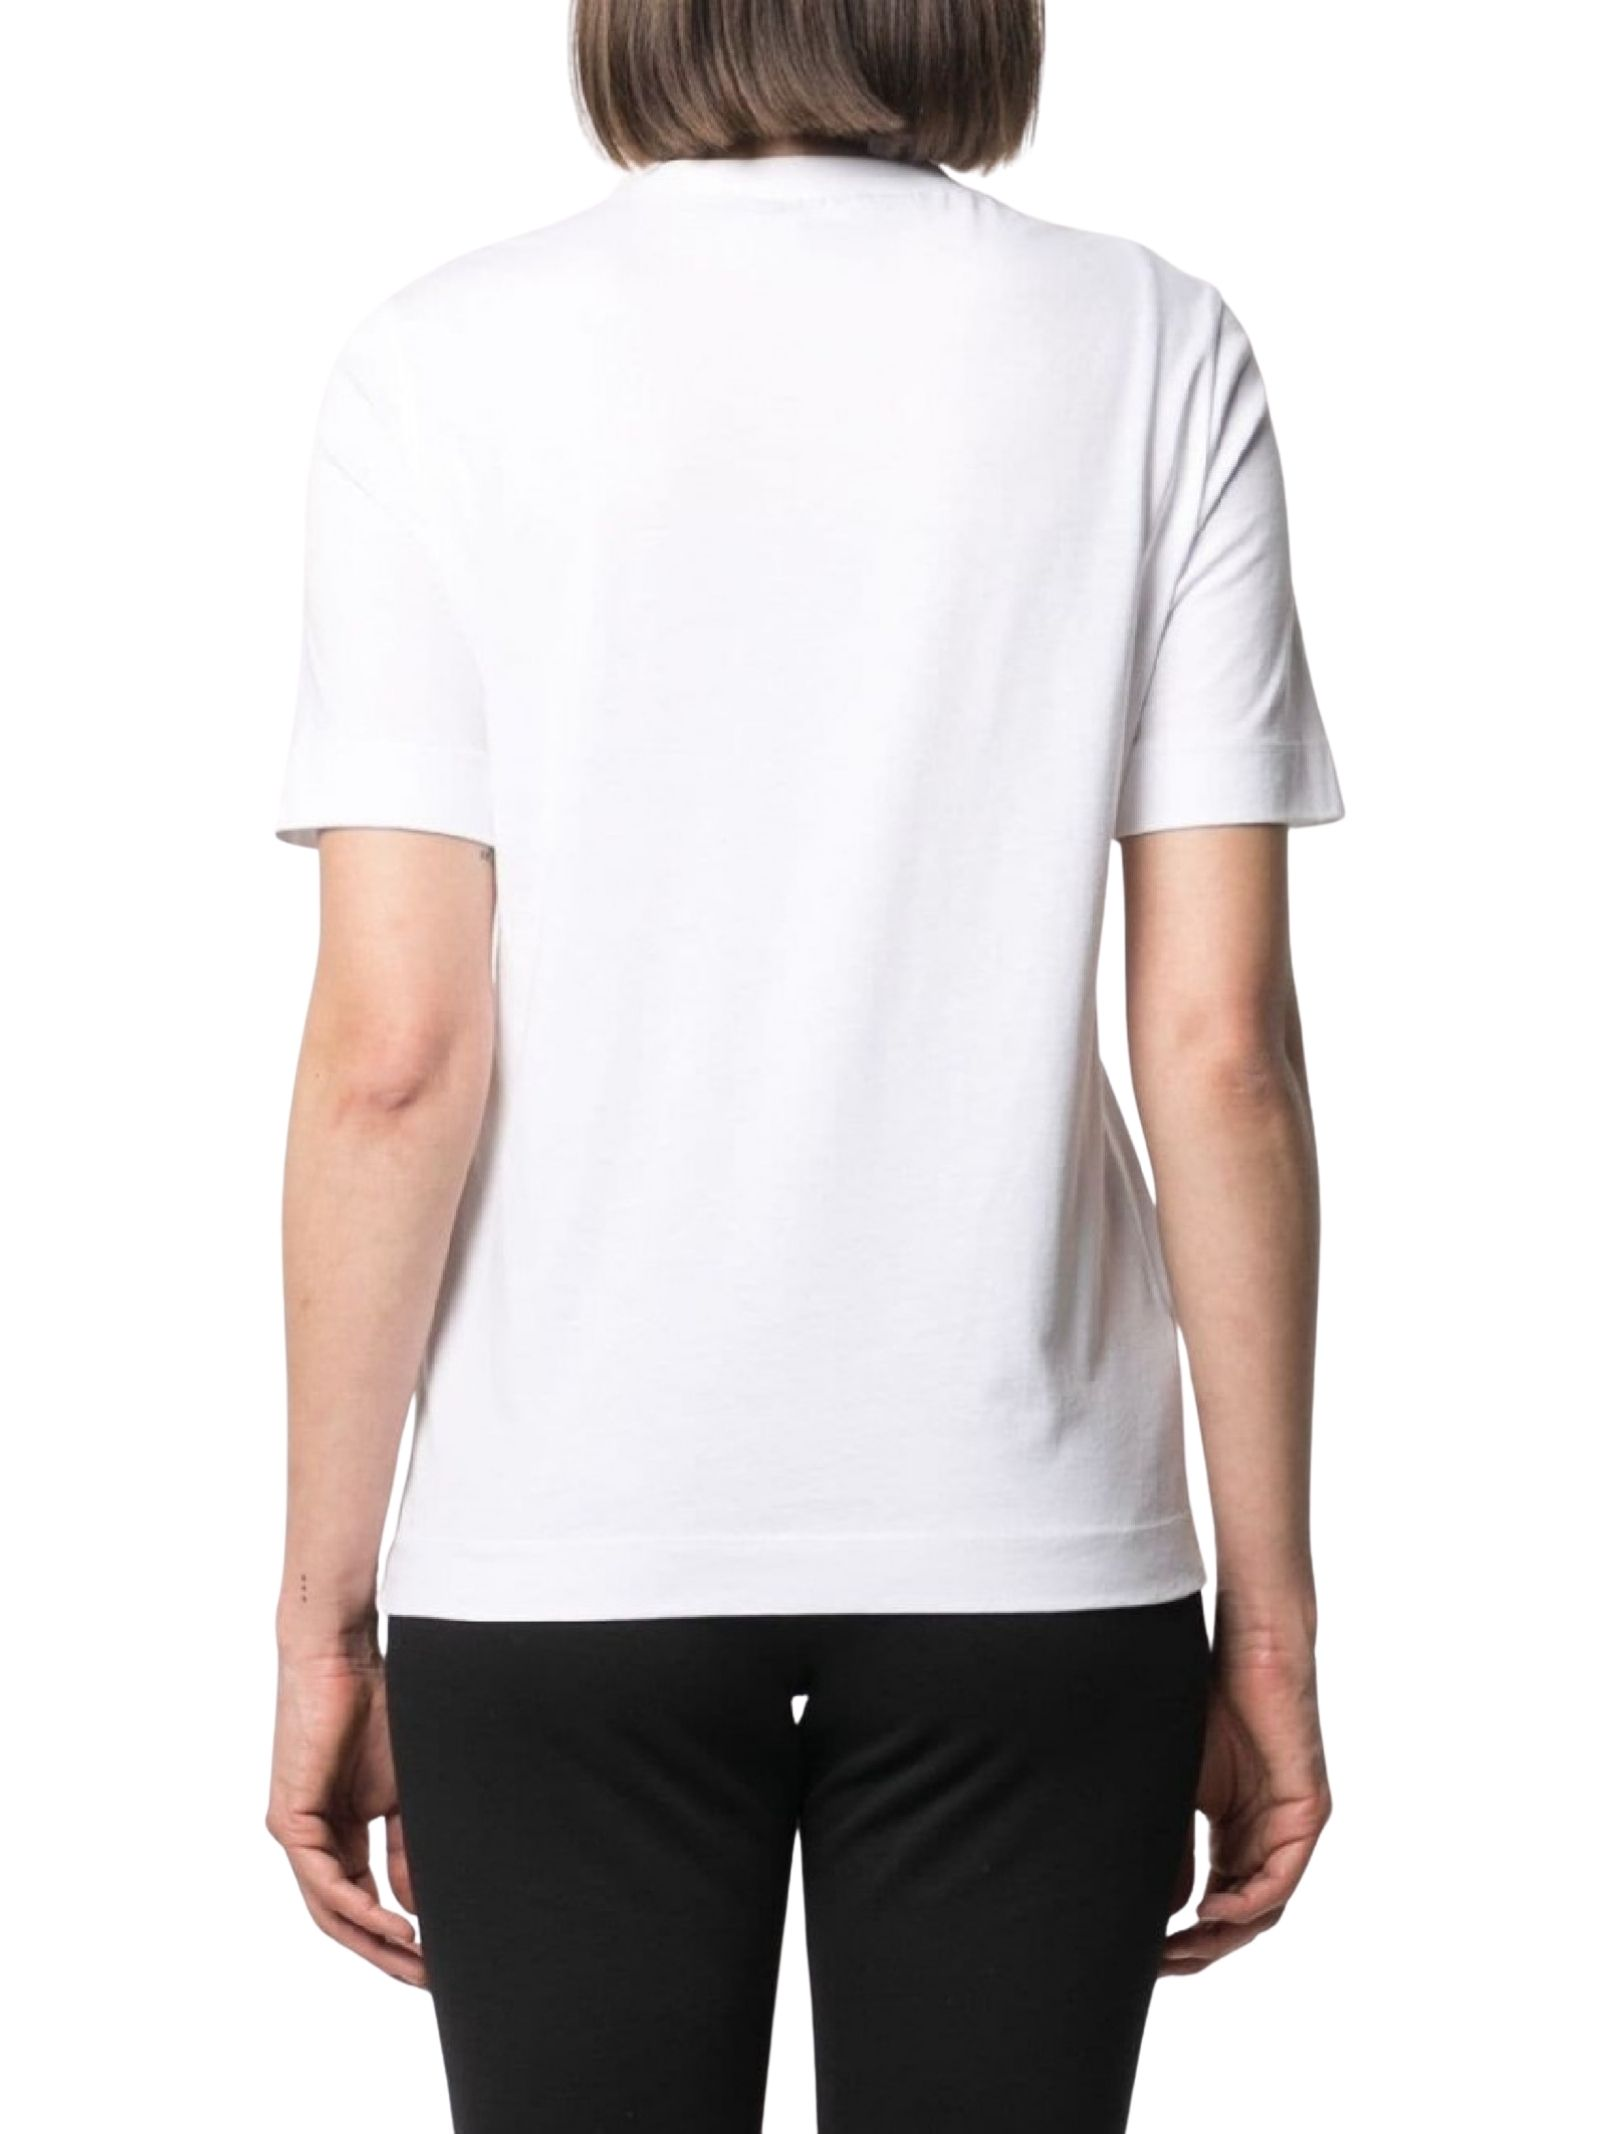 MOSCHINO LOVE | T-shirt | W 4 F15 3A M 3876A00